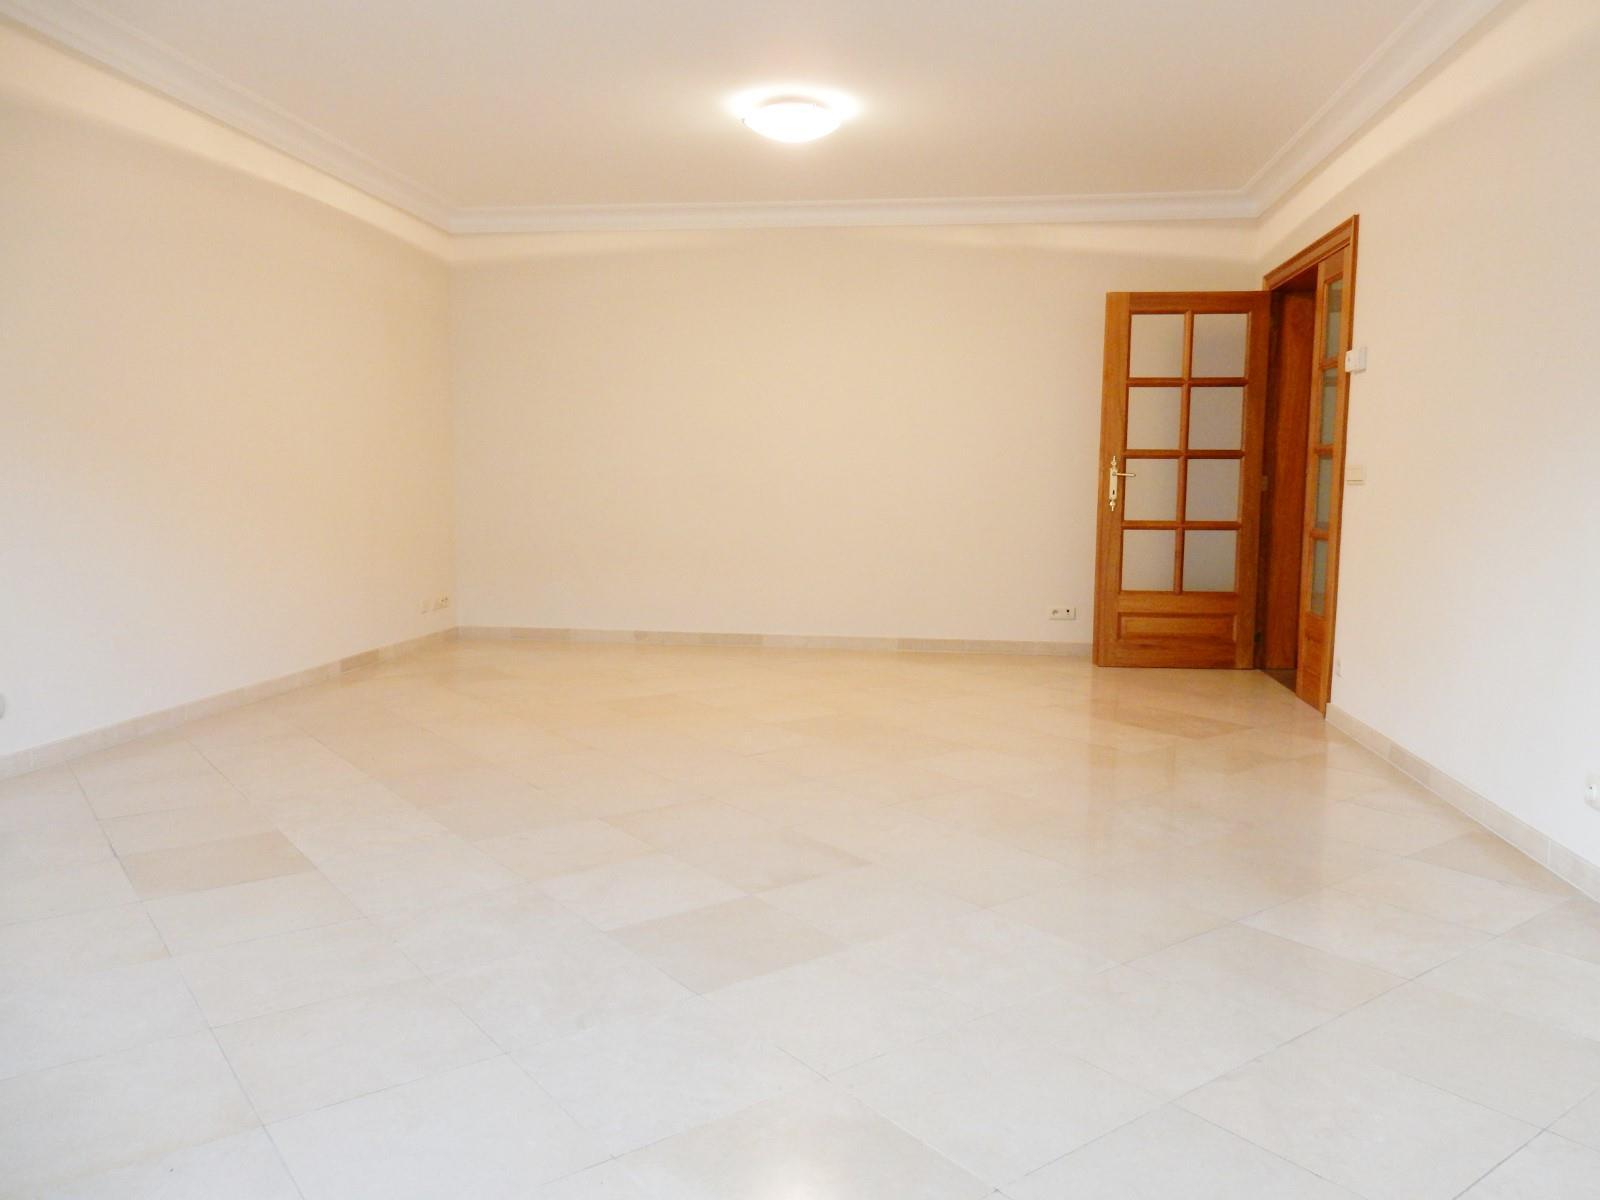 Exceptional apartment  - Woluwe-Saint-Pierre - #3201024-1